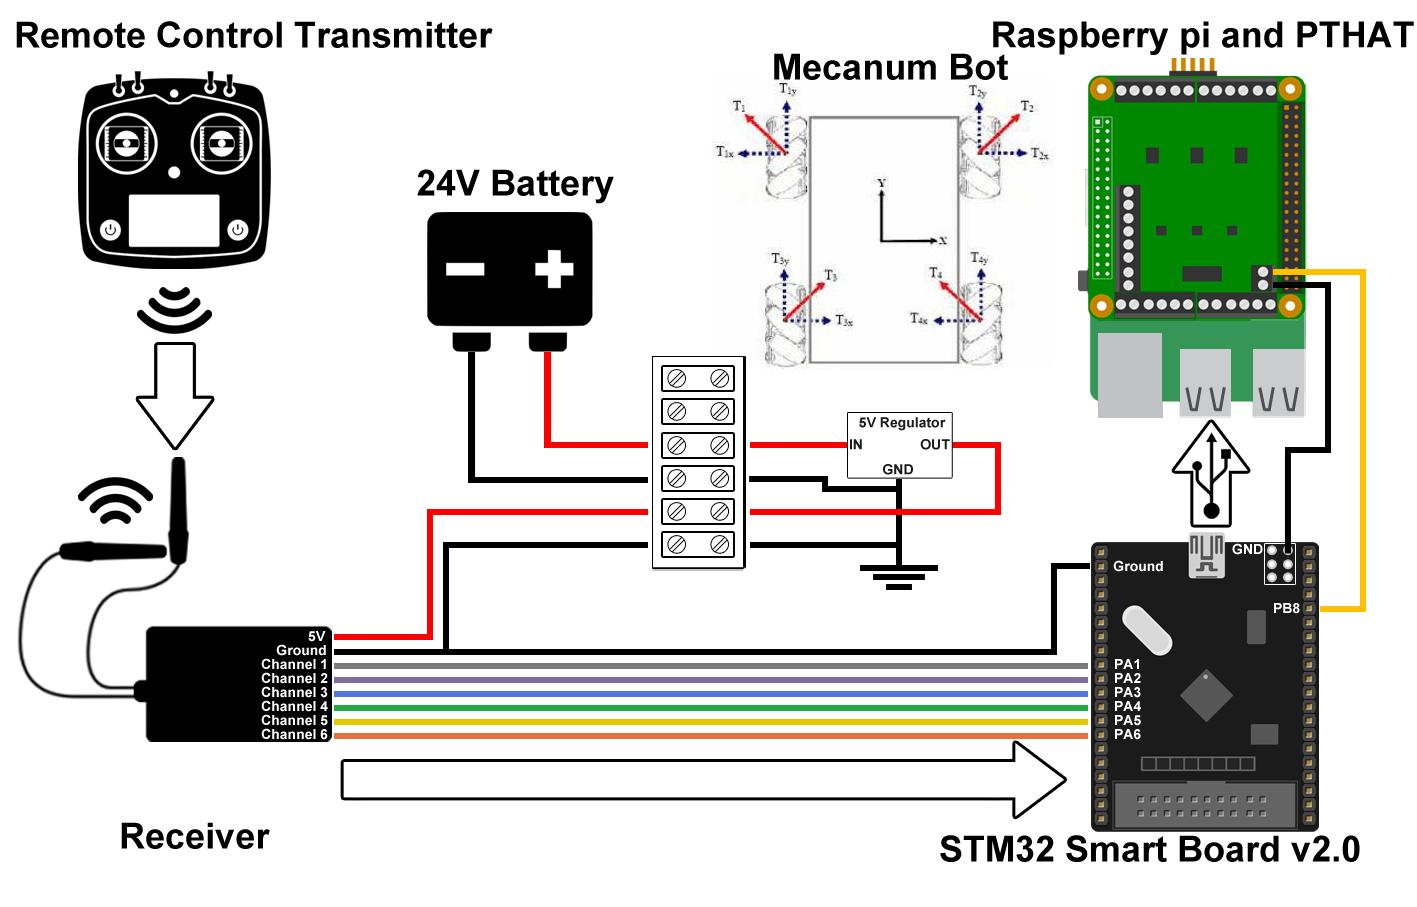 trex 450 wiring diagram